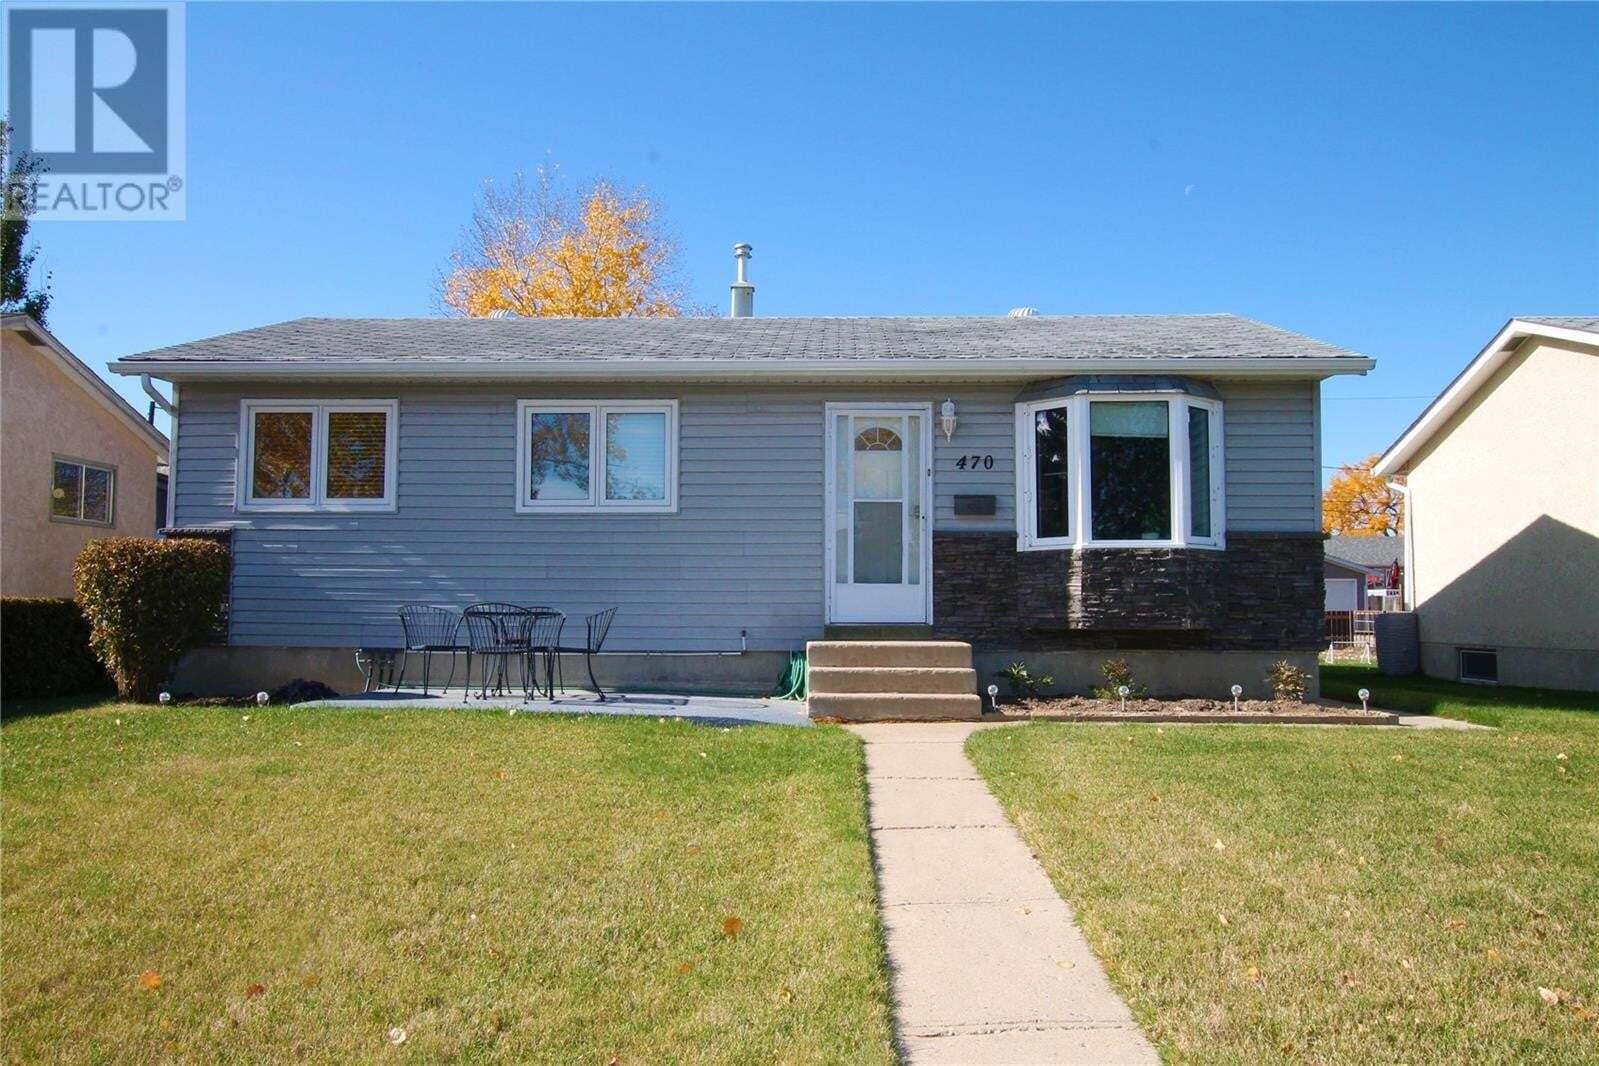 House for sale at 470 8th Ave SE Swift Current Saskatchewan - MLS: SK830621